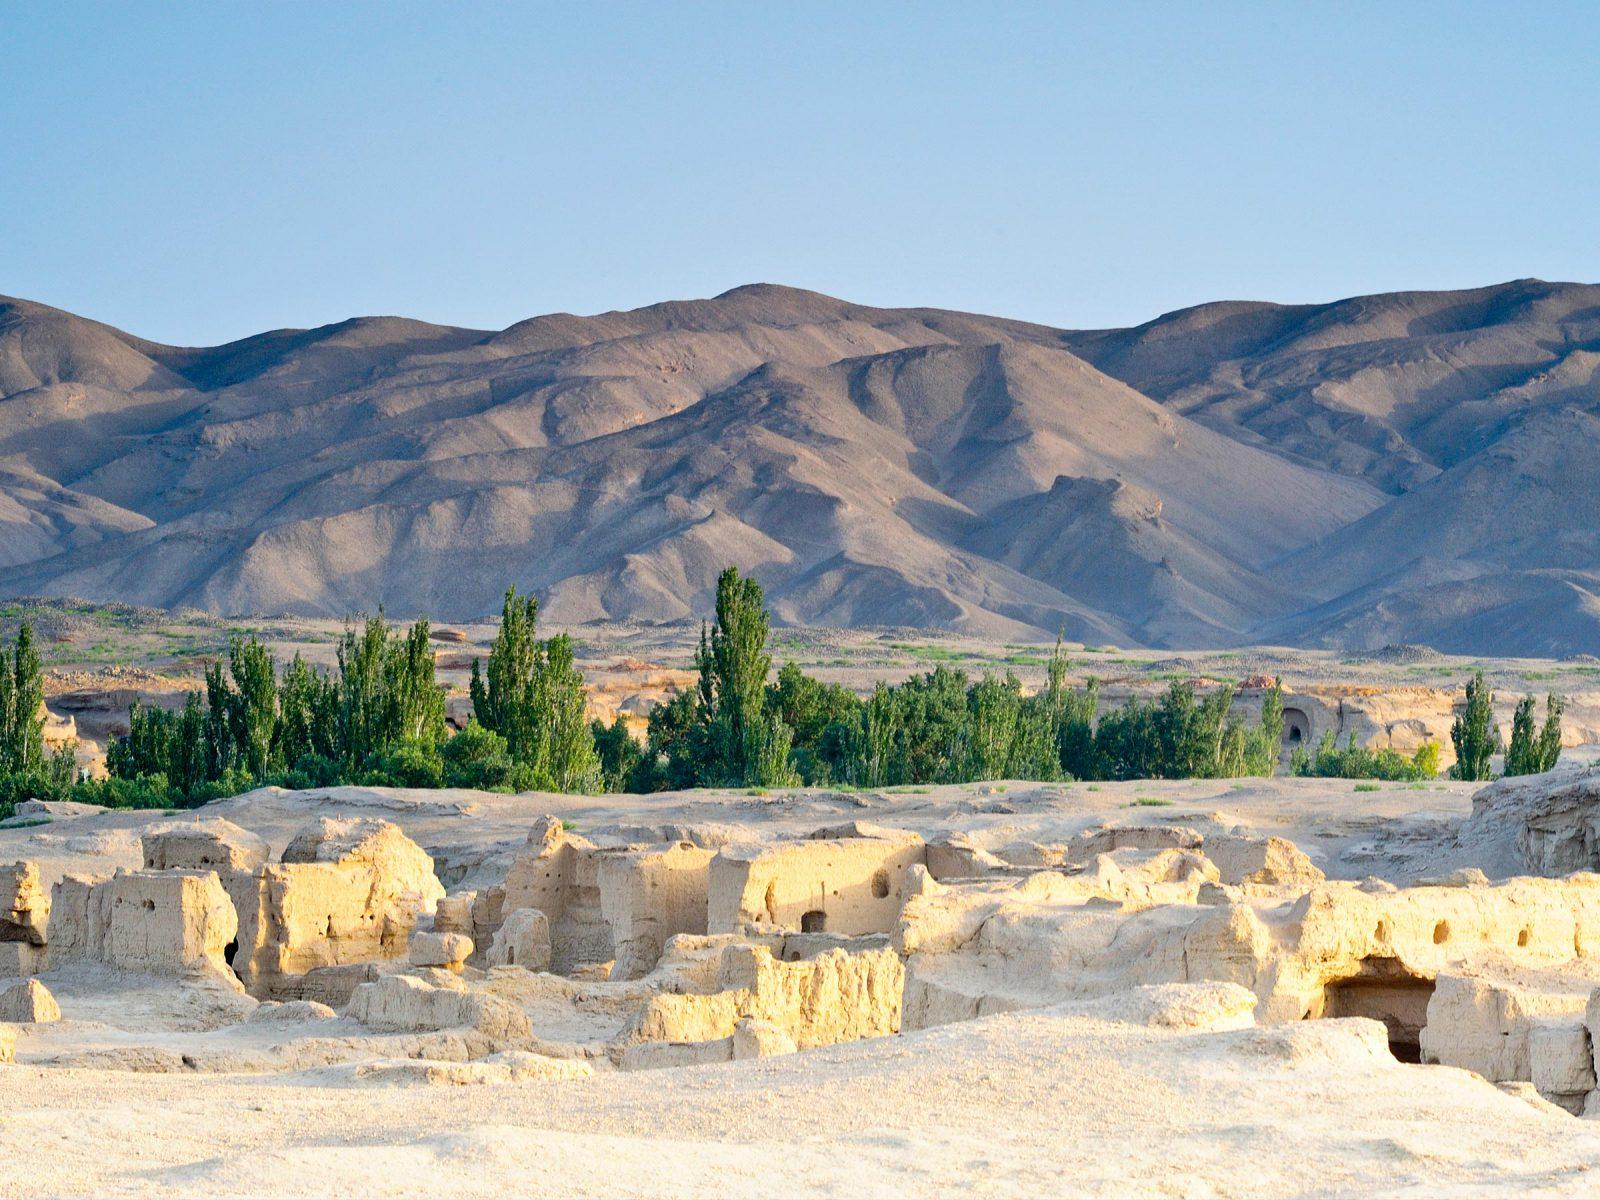 Ruins, desert, trees, and mountain. Photograph © iStock.com/dwatanabe.